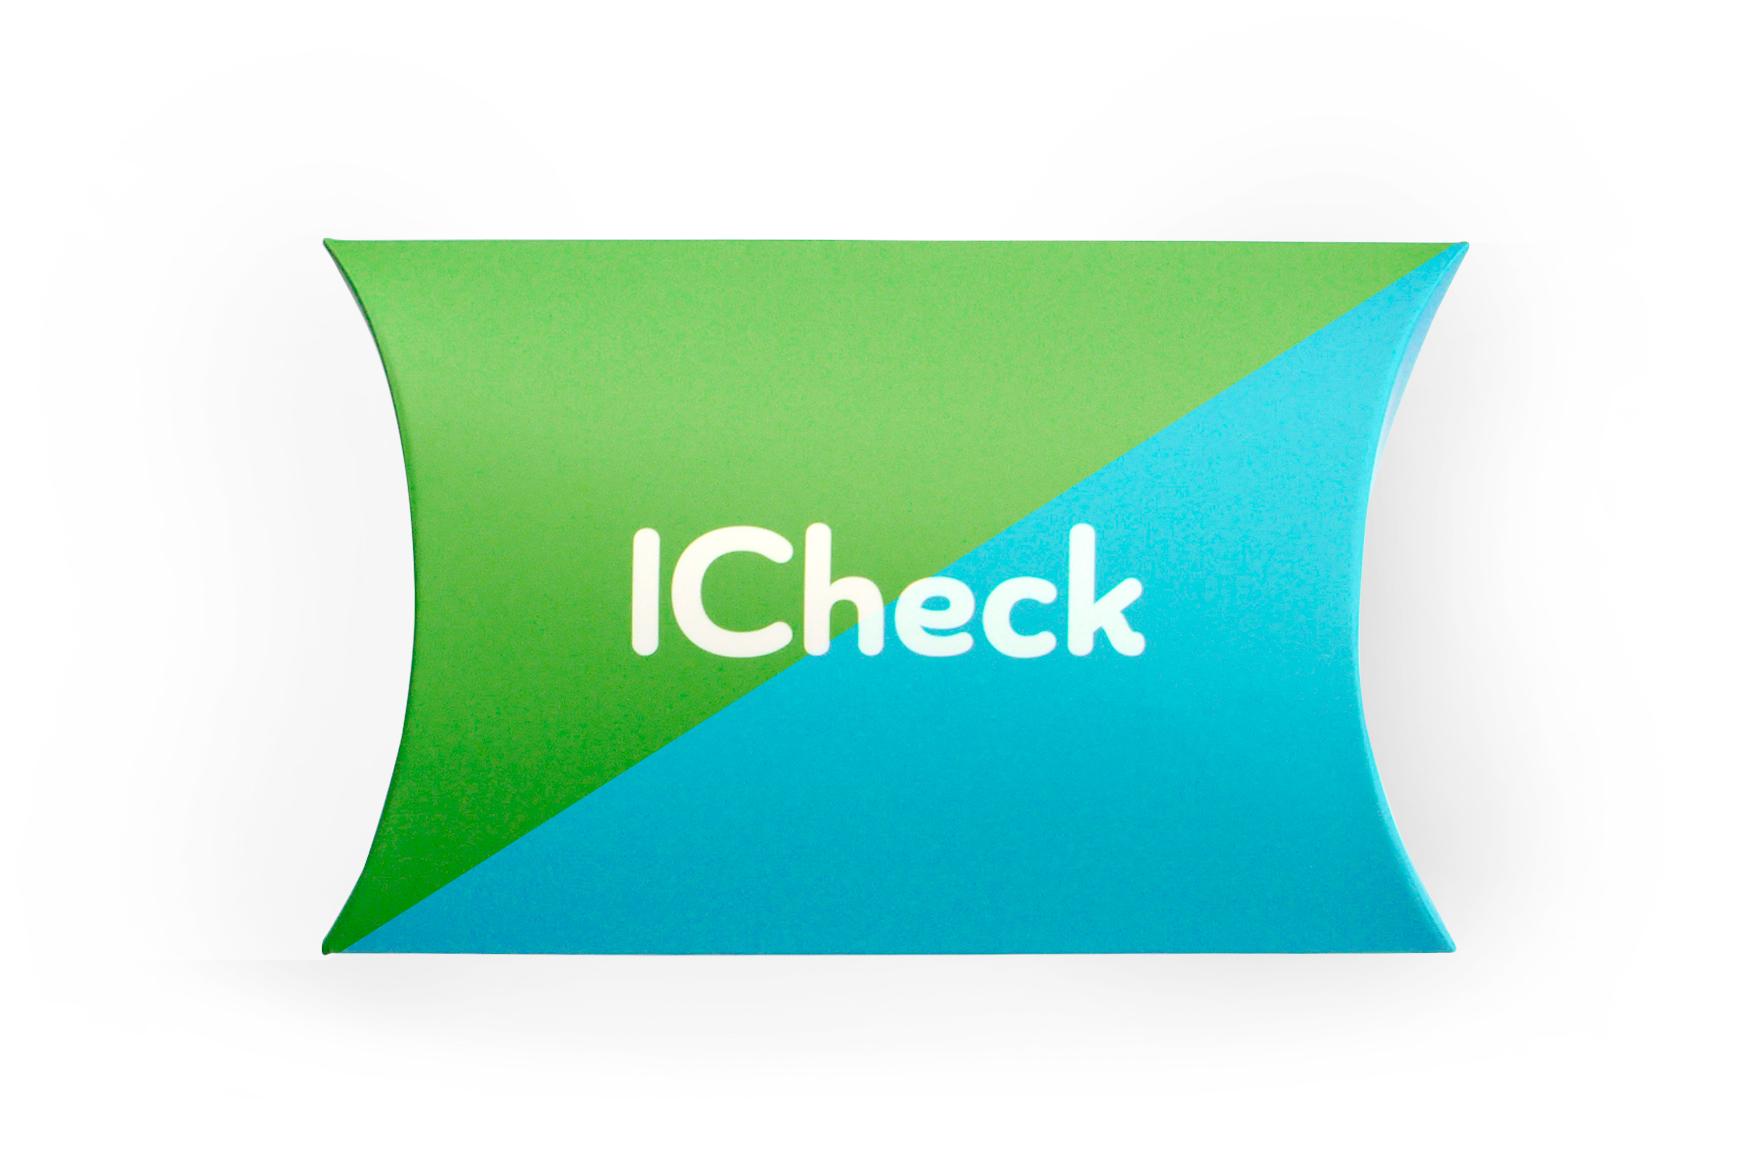 ICheck抗体検査10名分75,000円(税抜)